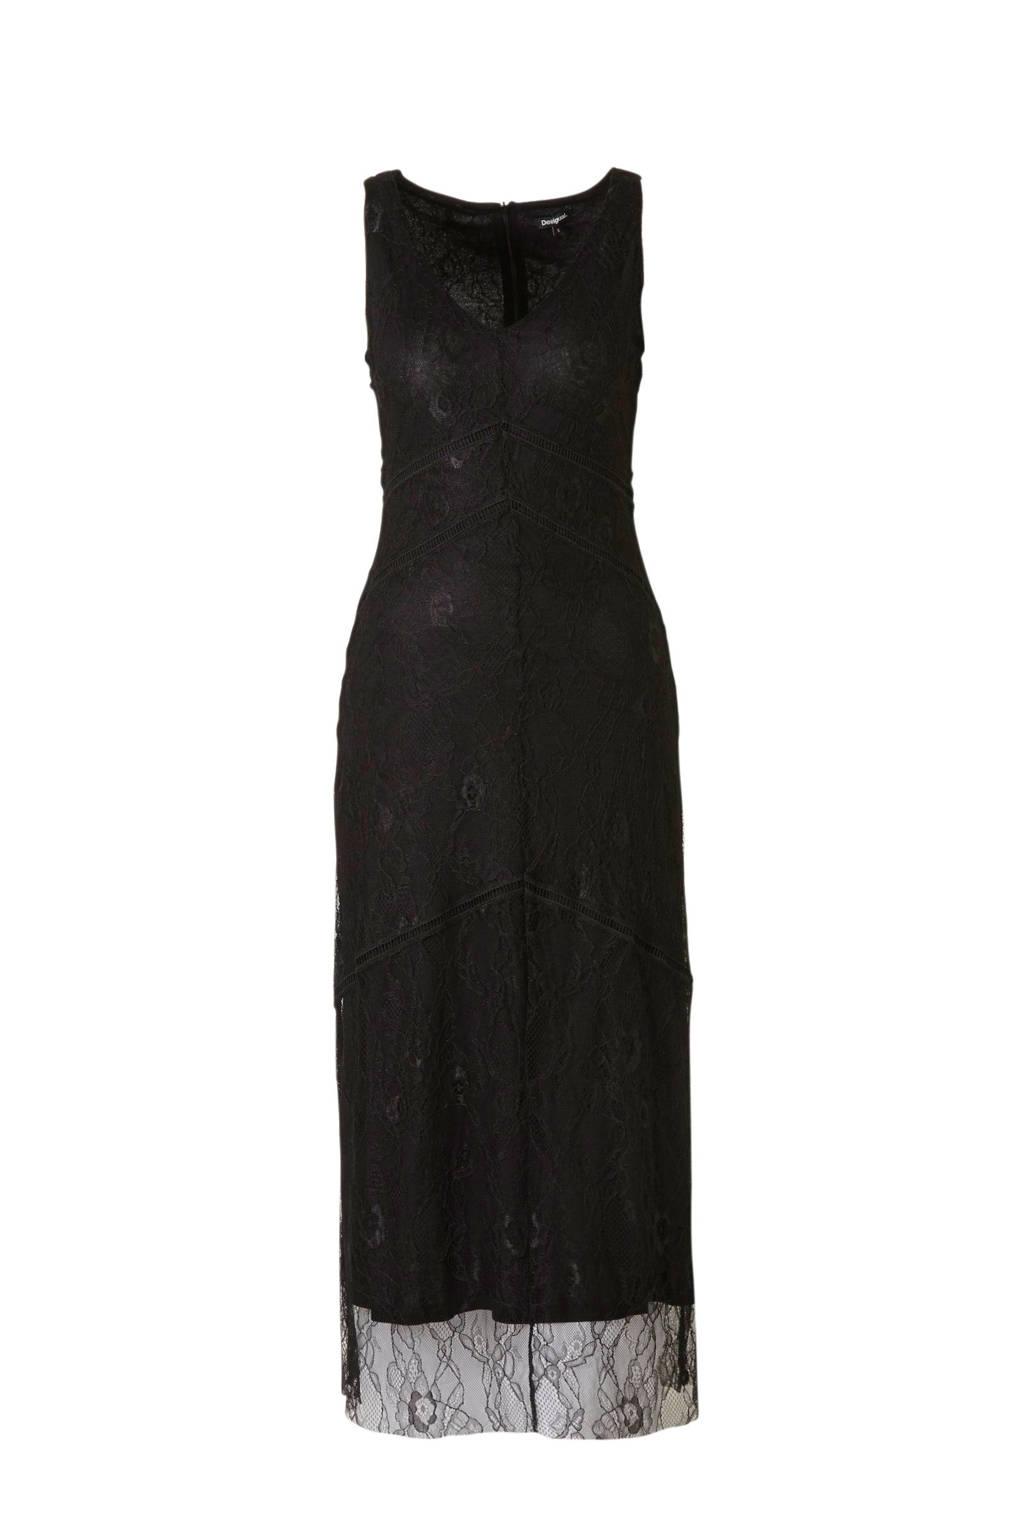 Desigual maxi jurk met kant zwart, Zwart